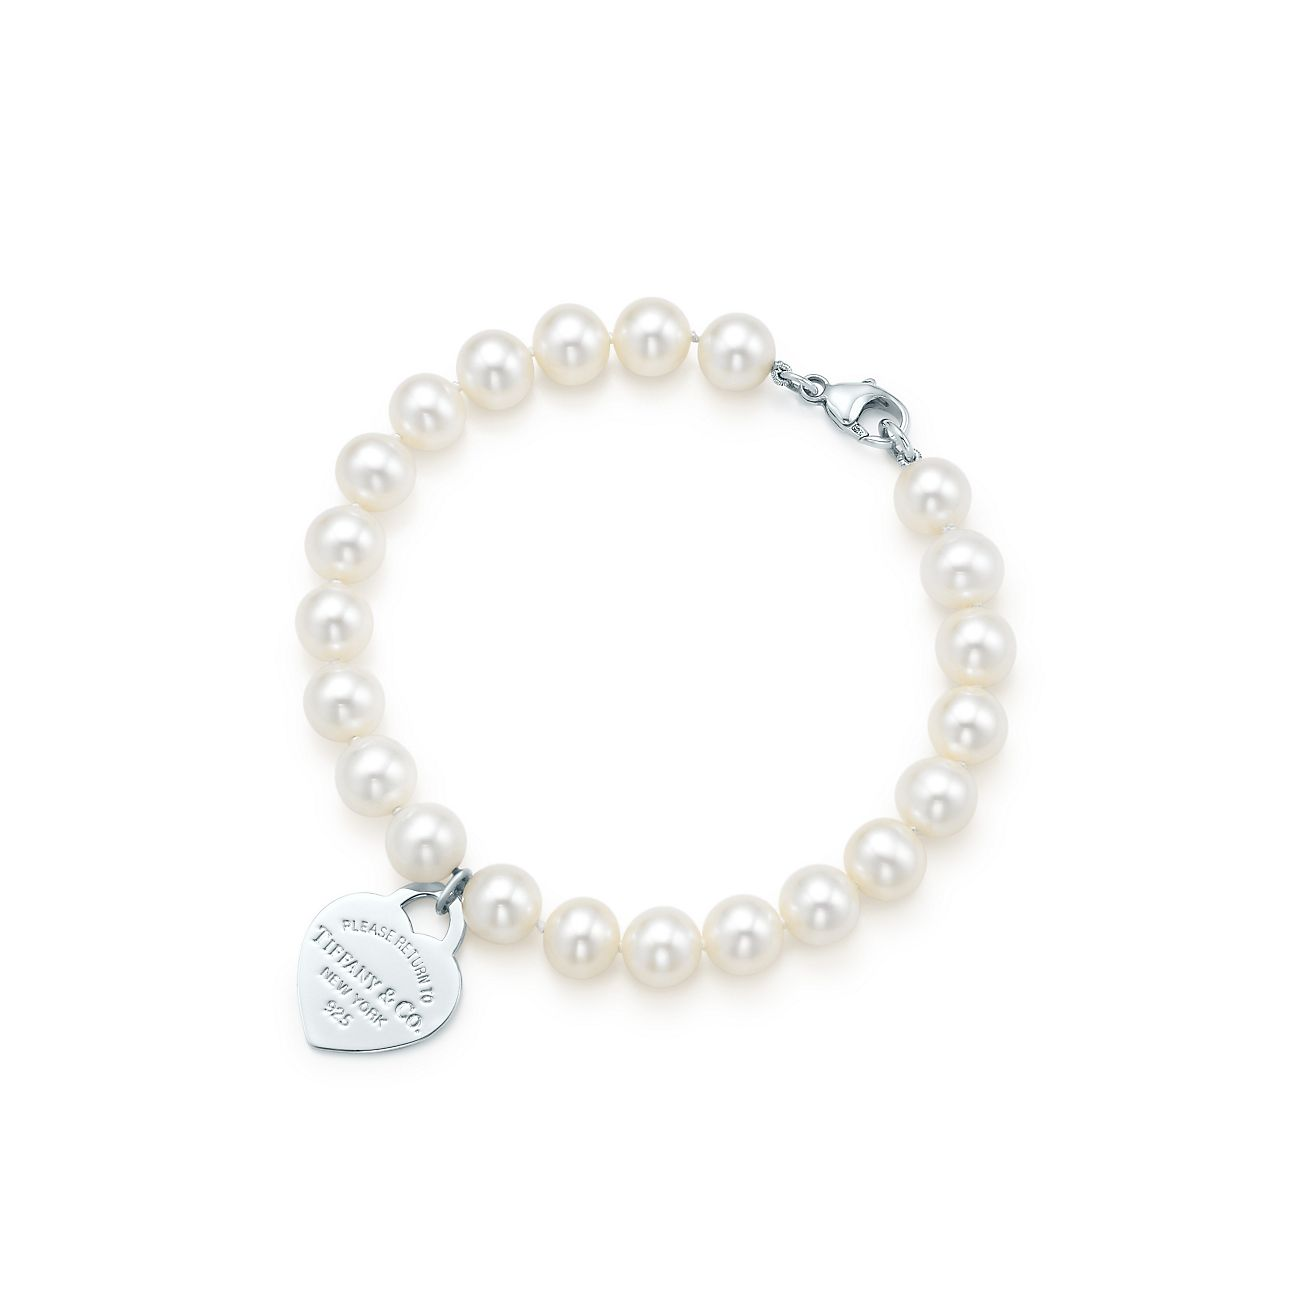 Tiffany Heart Bracelet >> Return to Tiffany™ small heart tag in silver on a ...